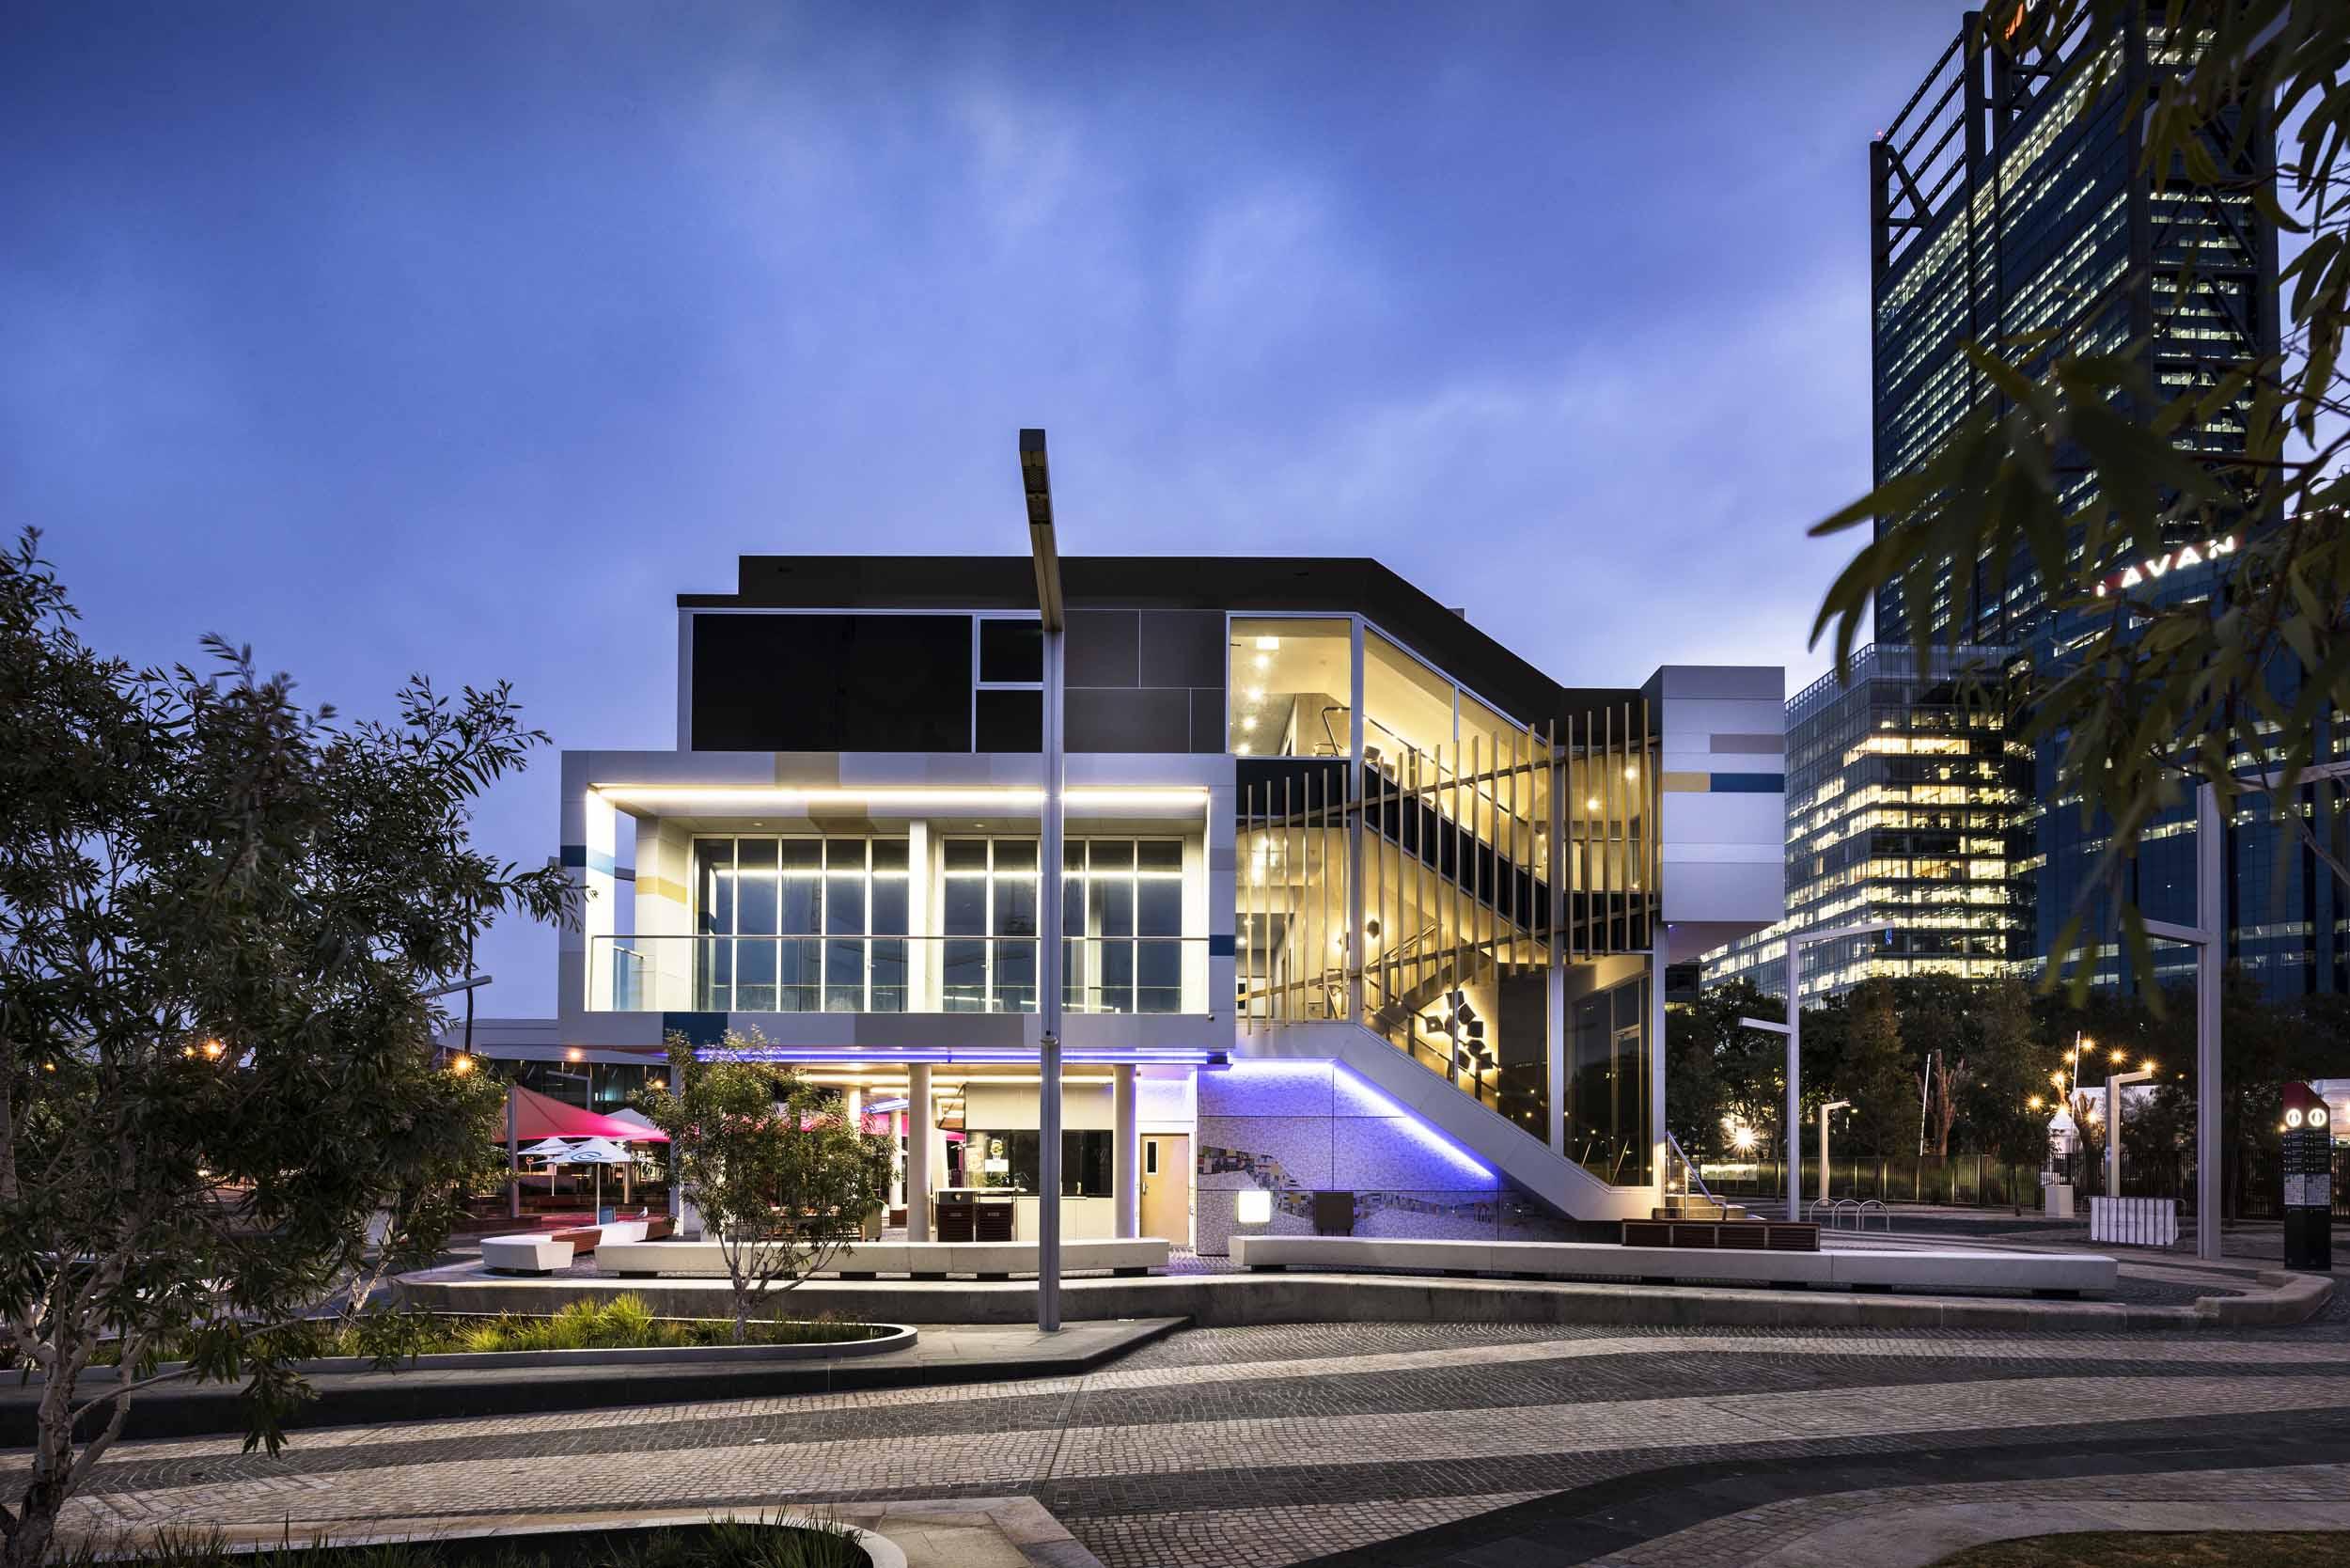 elizabeth-quay-perth-public-food-beverage-outlet-western-australia-architecture-architect-building-design-designer-building-architectural-side.jpg